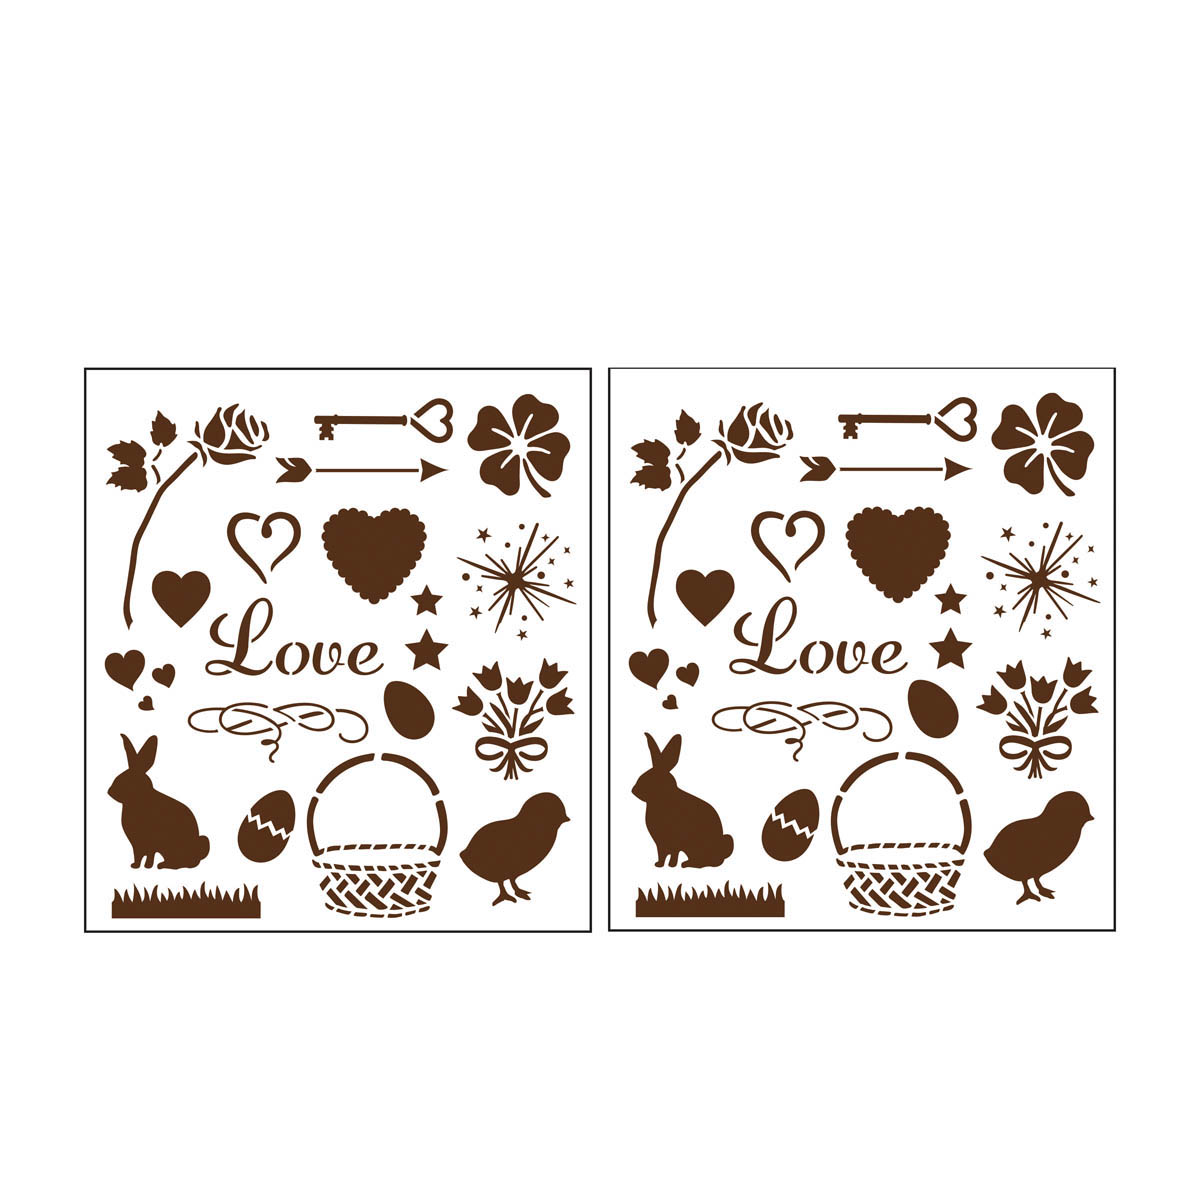 Martha Stewart Crafts ® Holiday Icons Laser-Cut Stencils